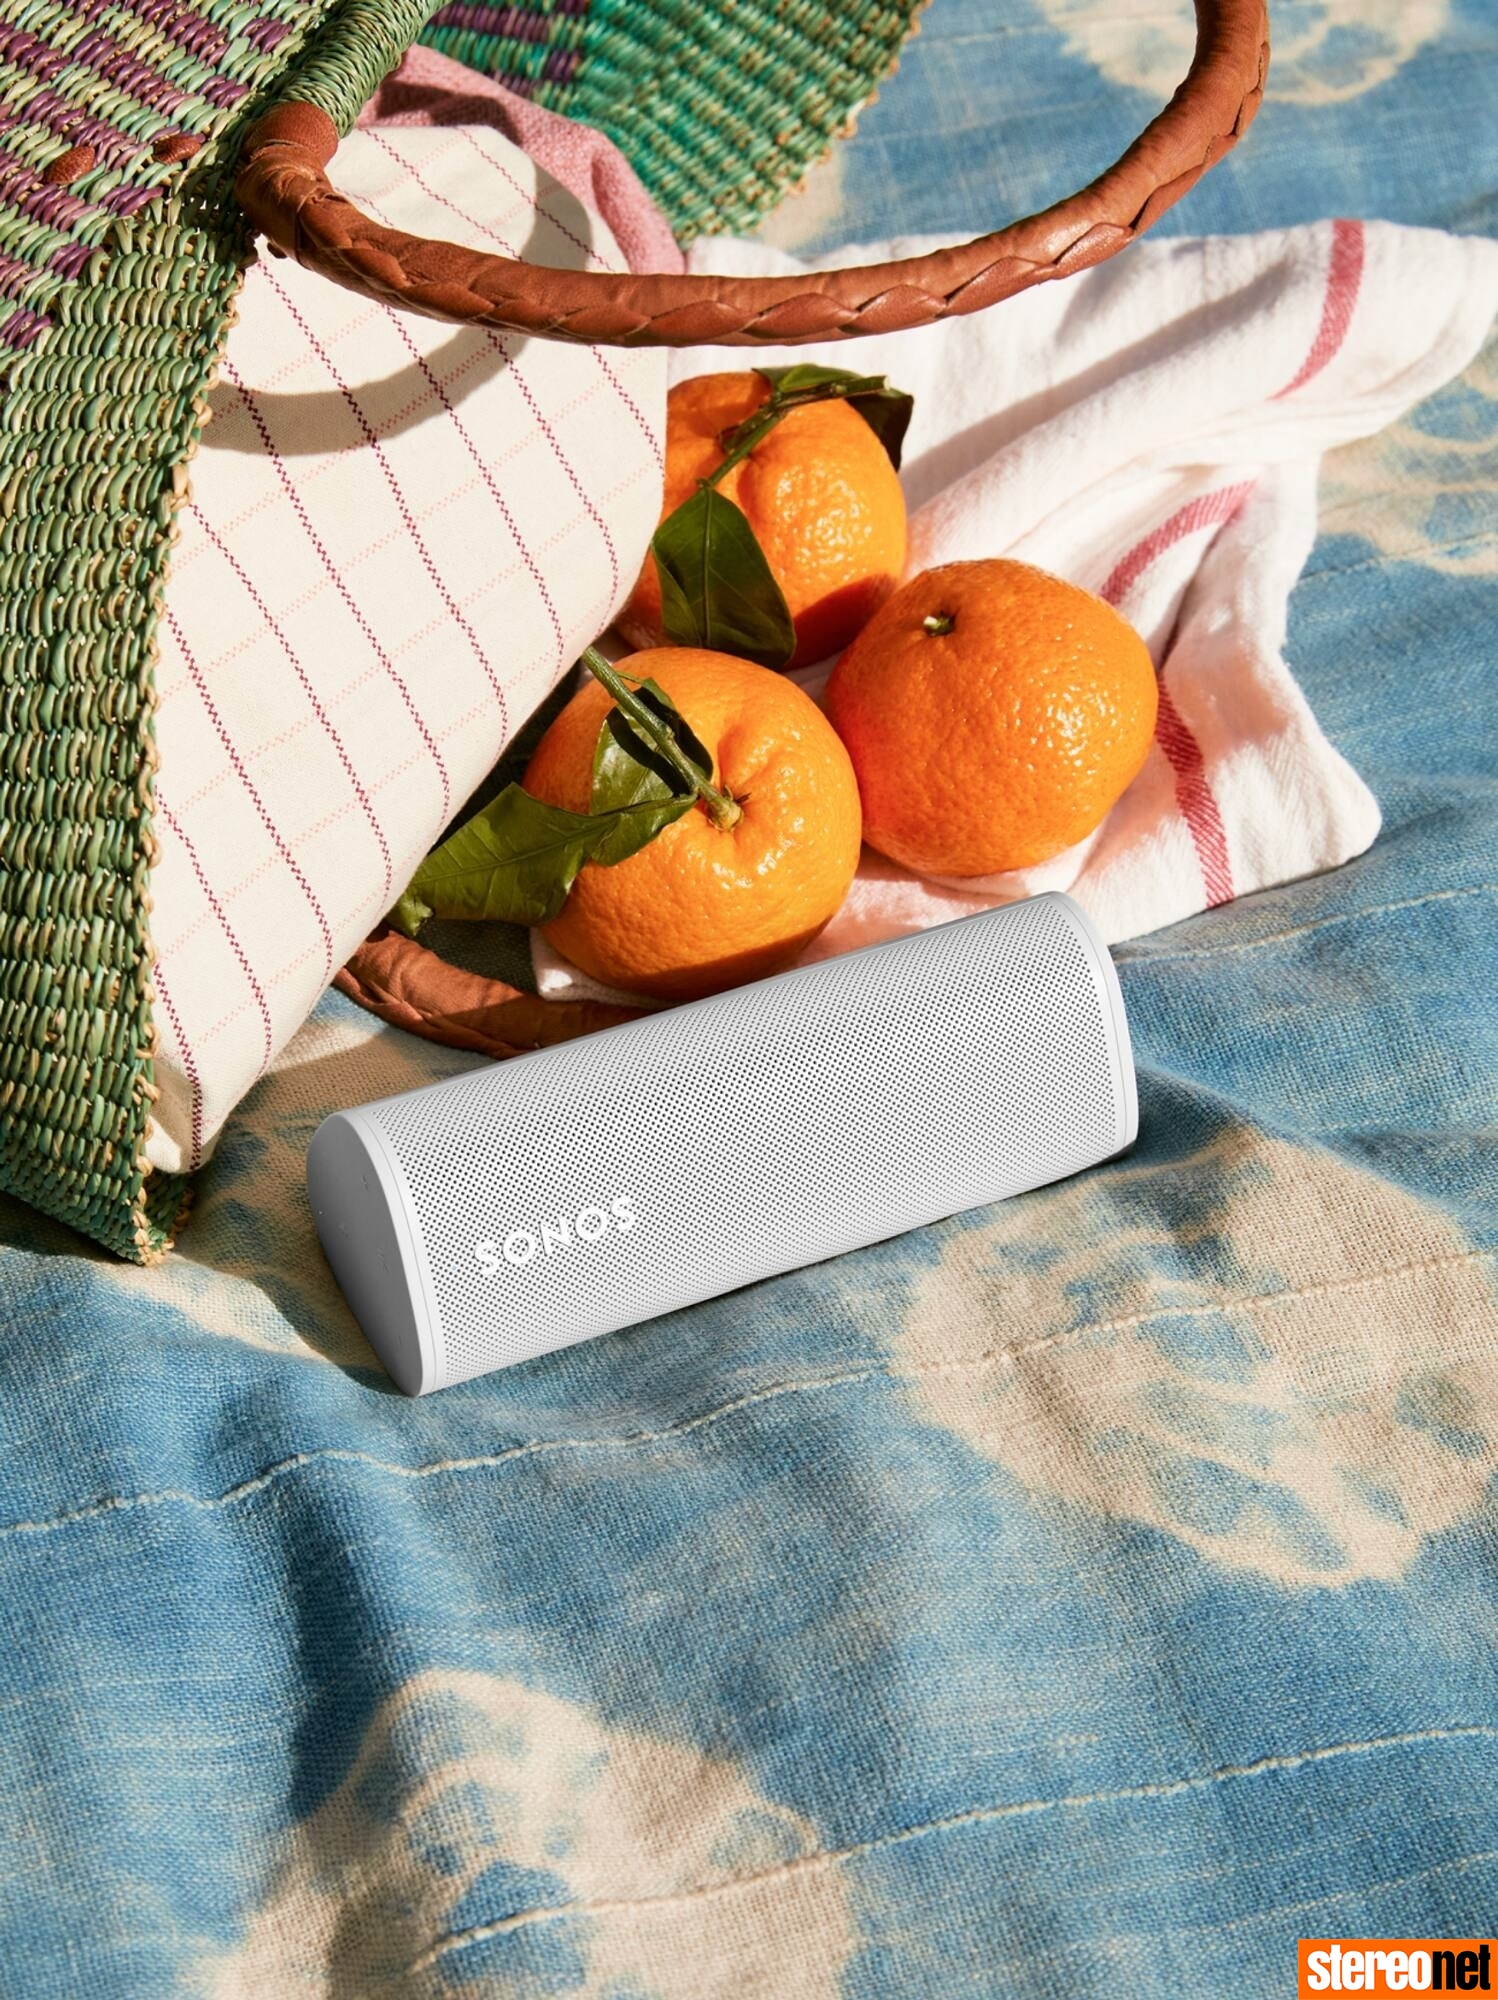 24-bit Qobuz hi-res on Sonos